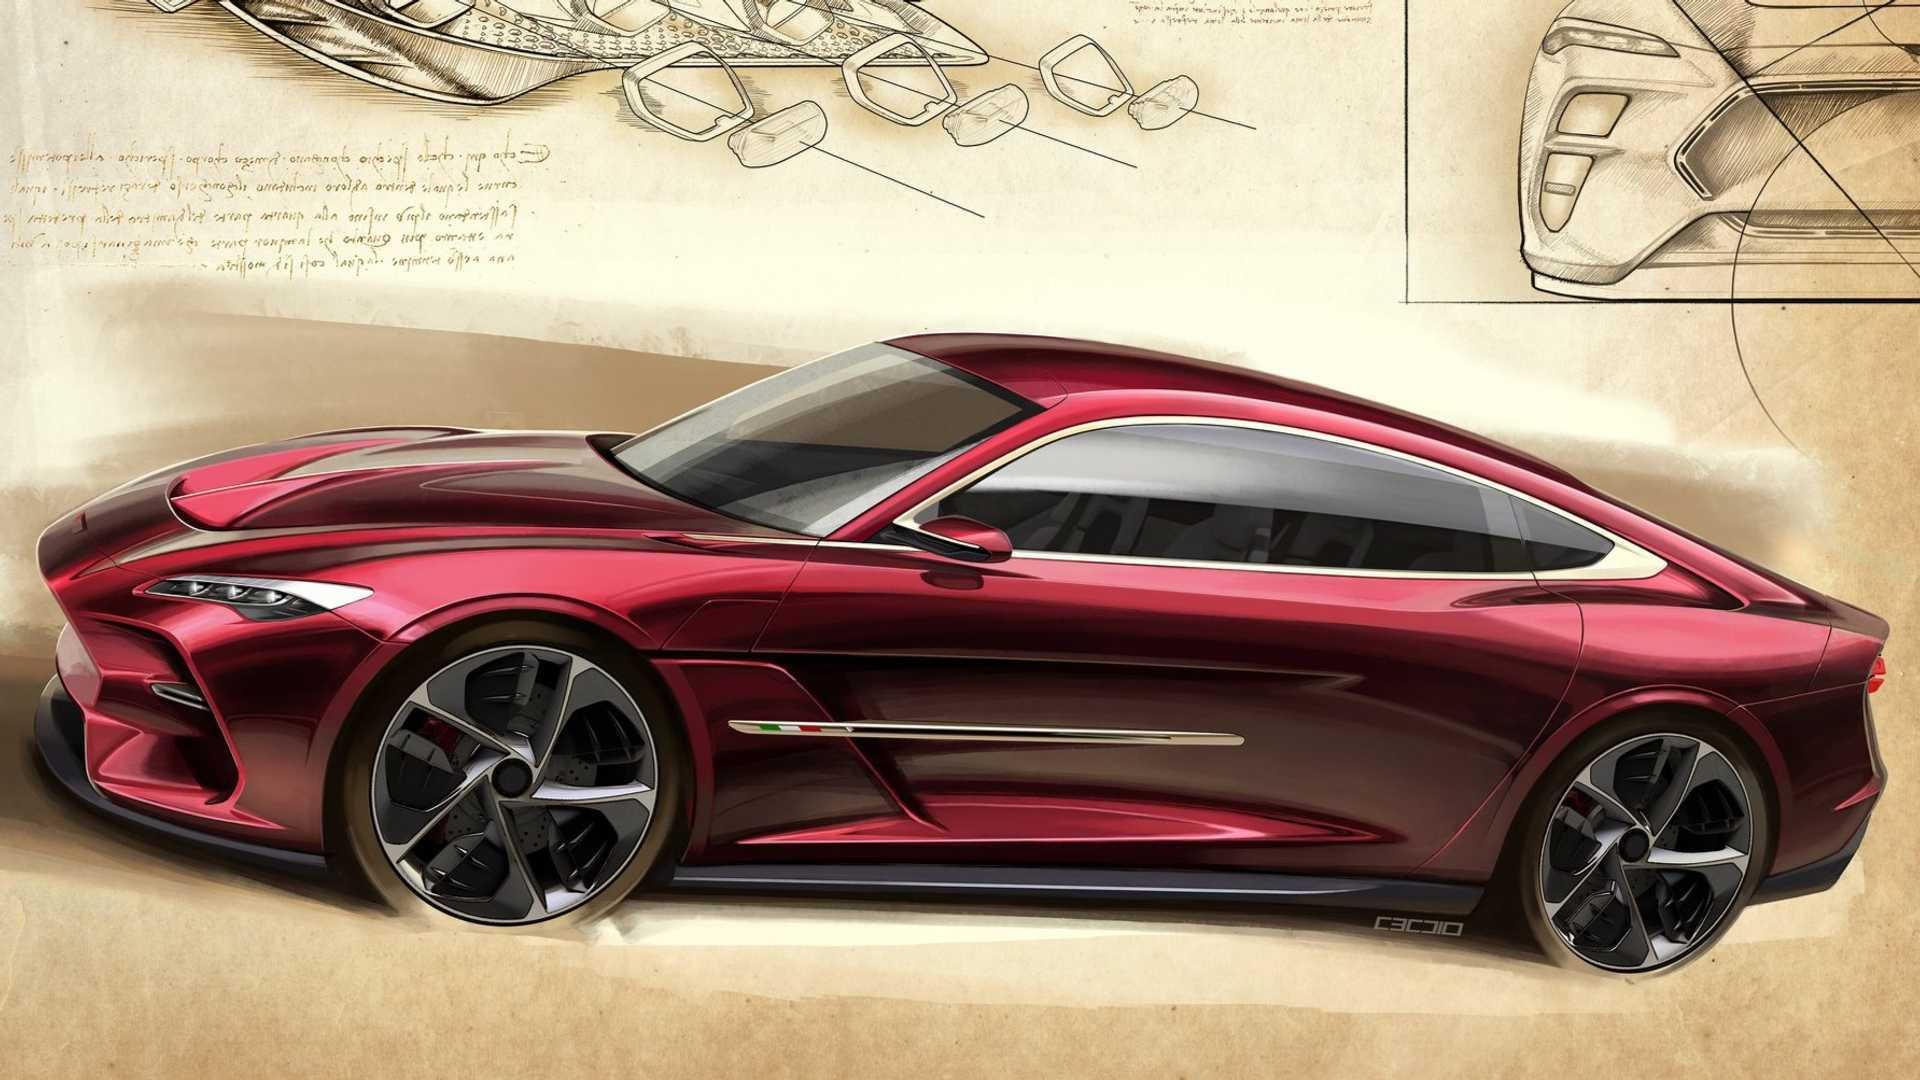 Italdesign sketch of concept car for 2019 Geneva motor show